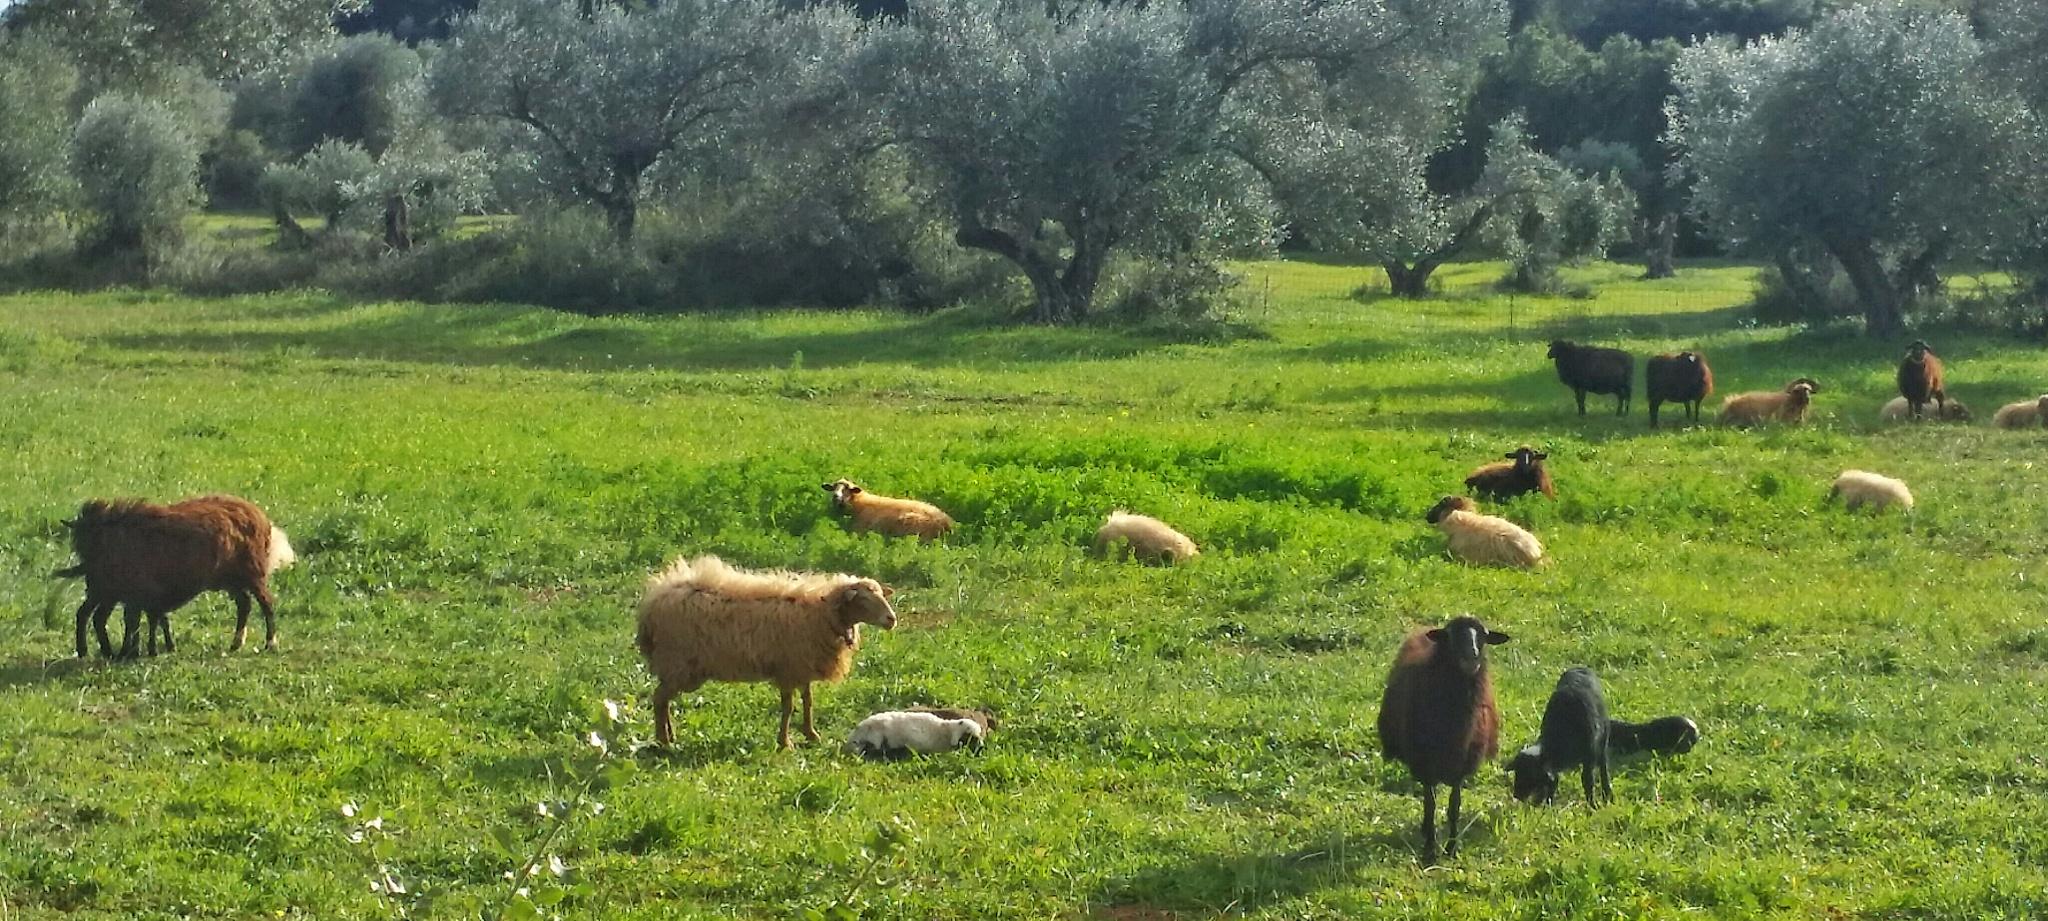 Sheep in the field by vasilis fragiskatos